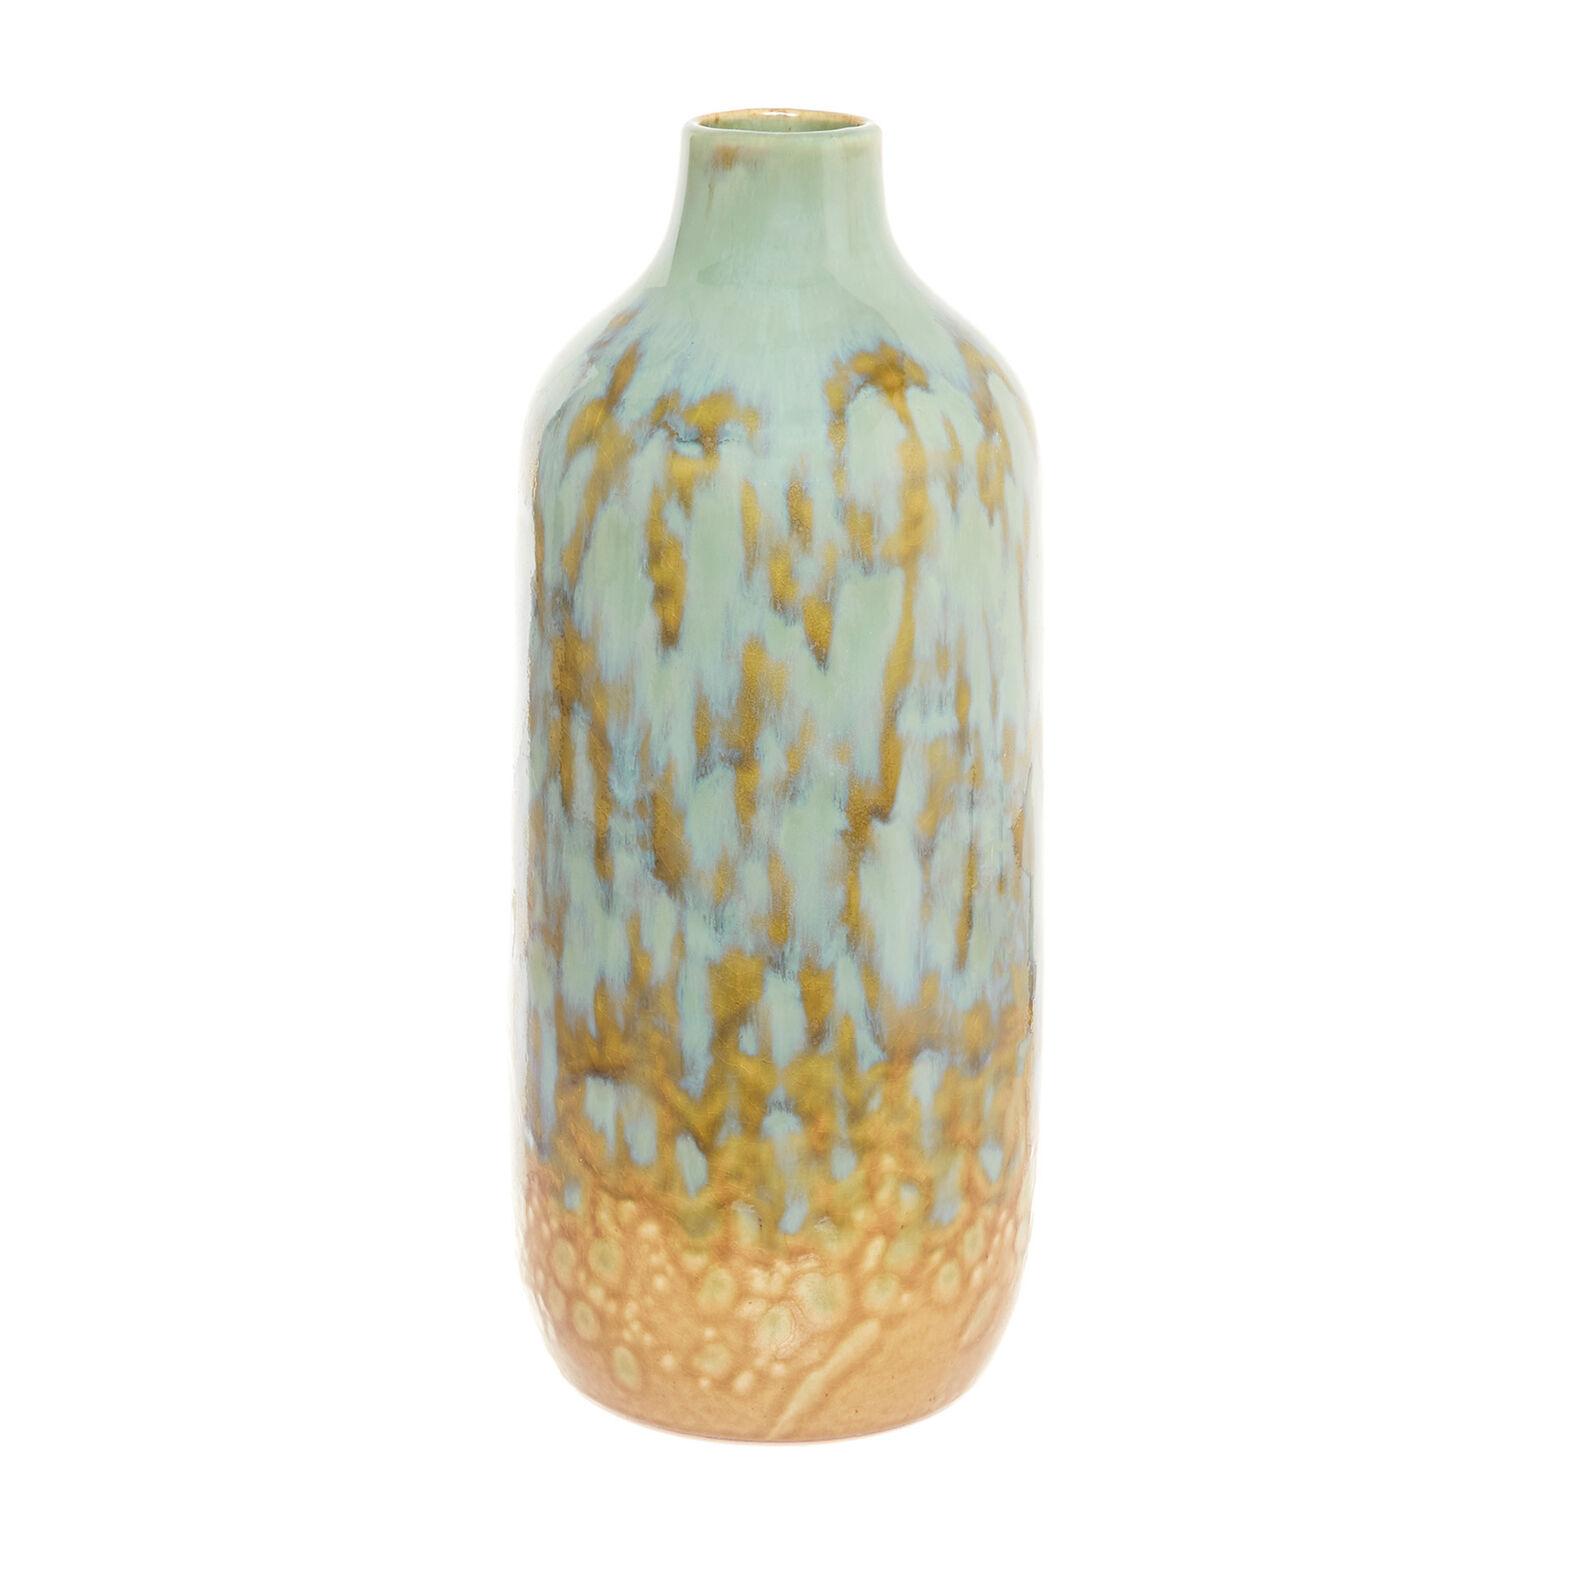 Ceramic bottle vase with reactive glazes